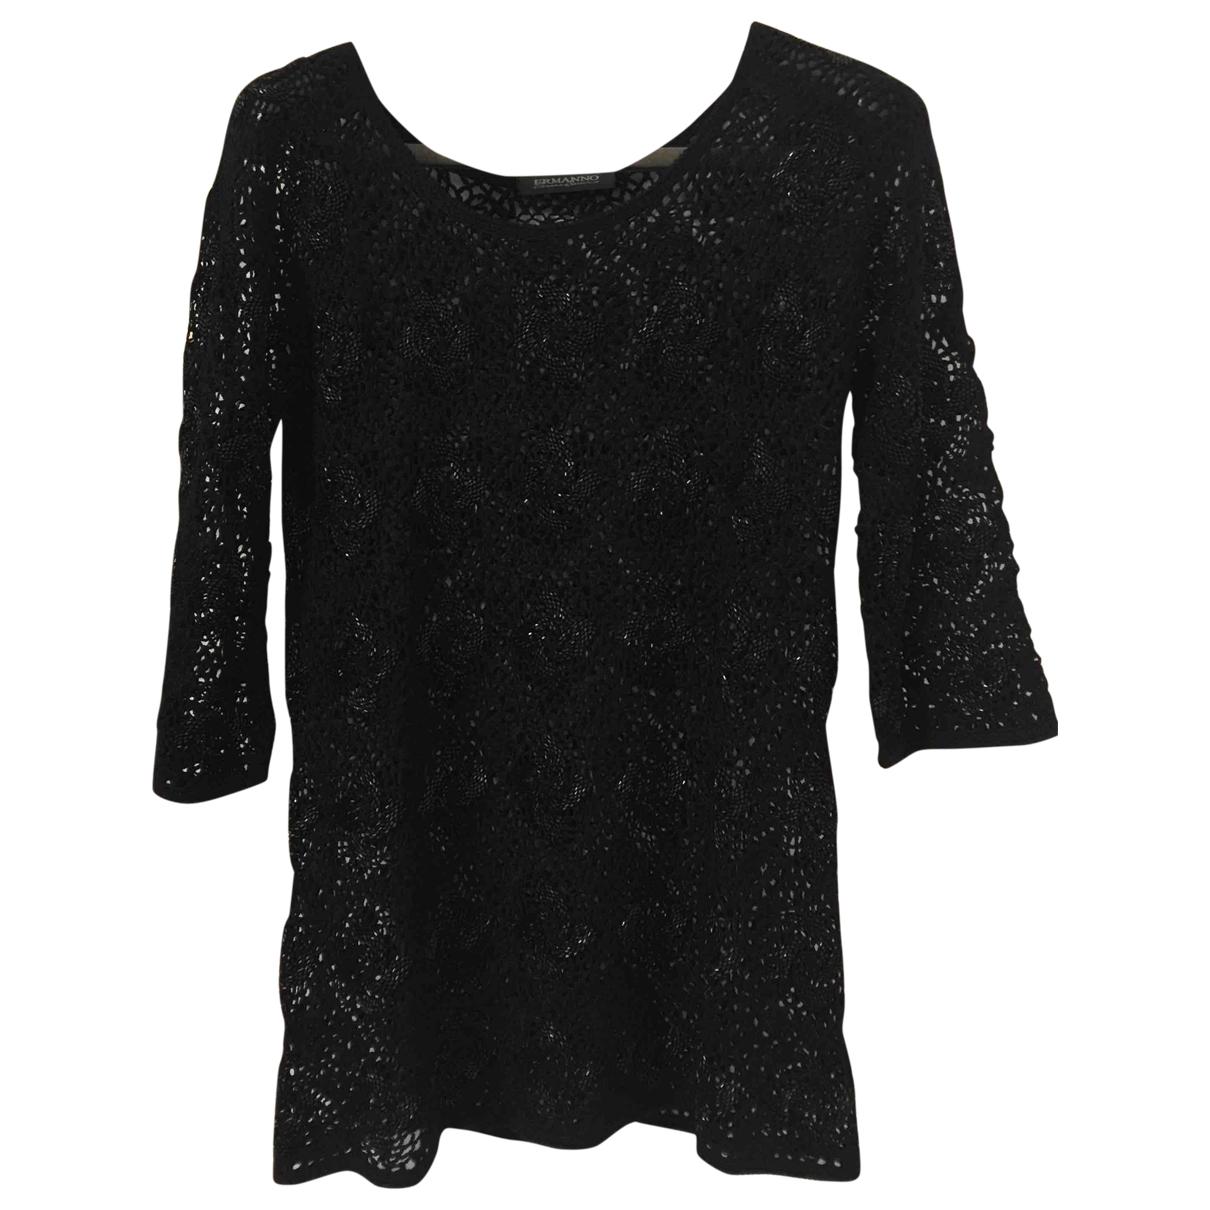 Ermanno Scervino \N Black Cotton Knitwear for Women M International